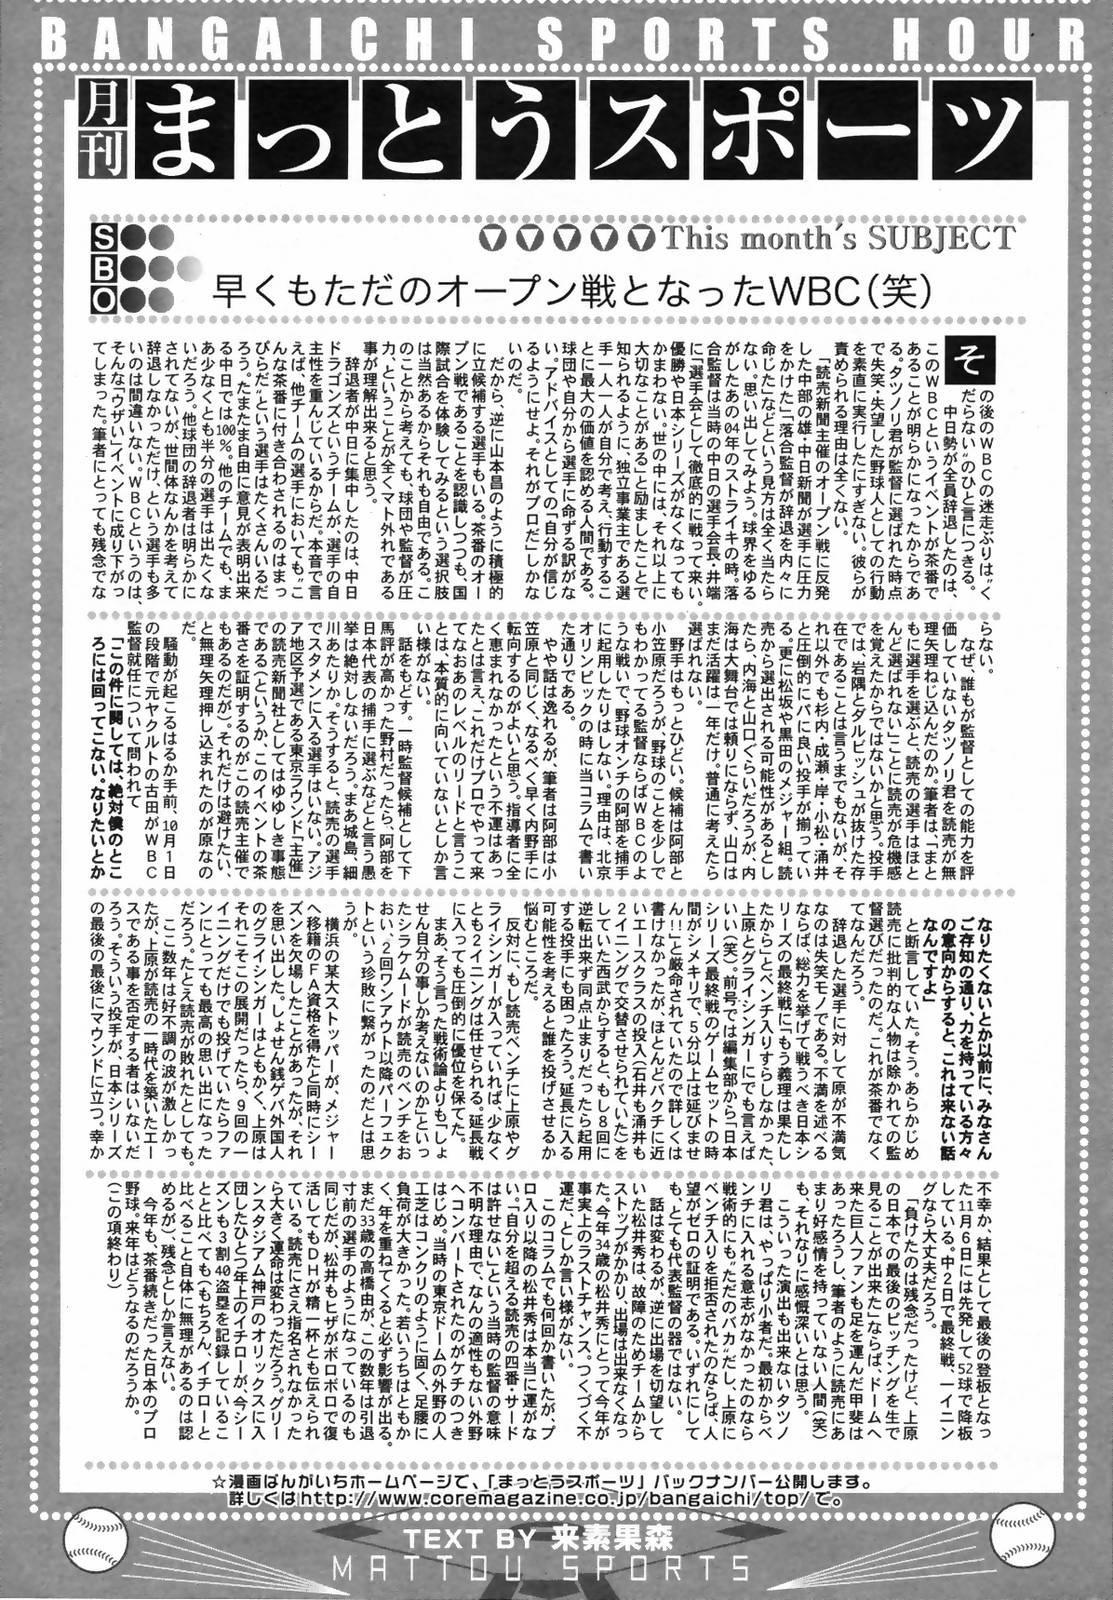 Manga Bangaichi 2009-02 Vol. 234 246